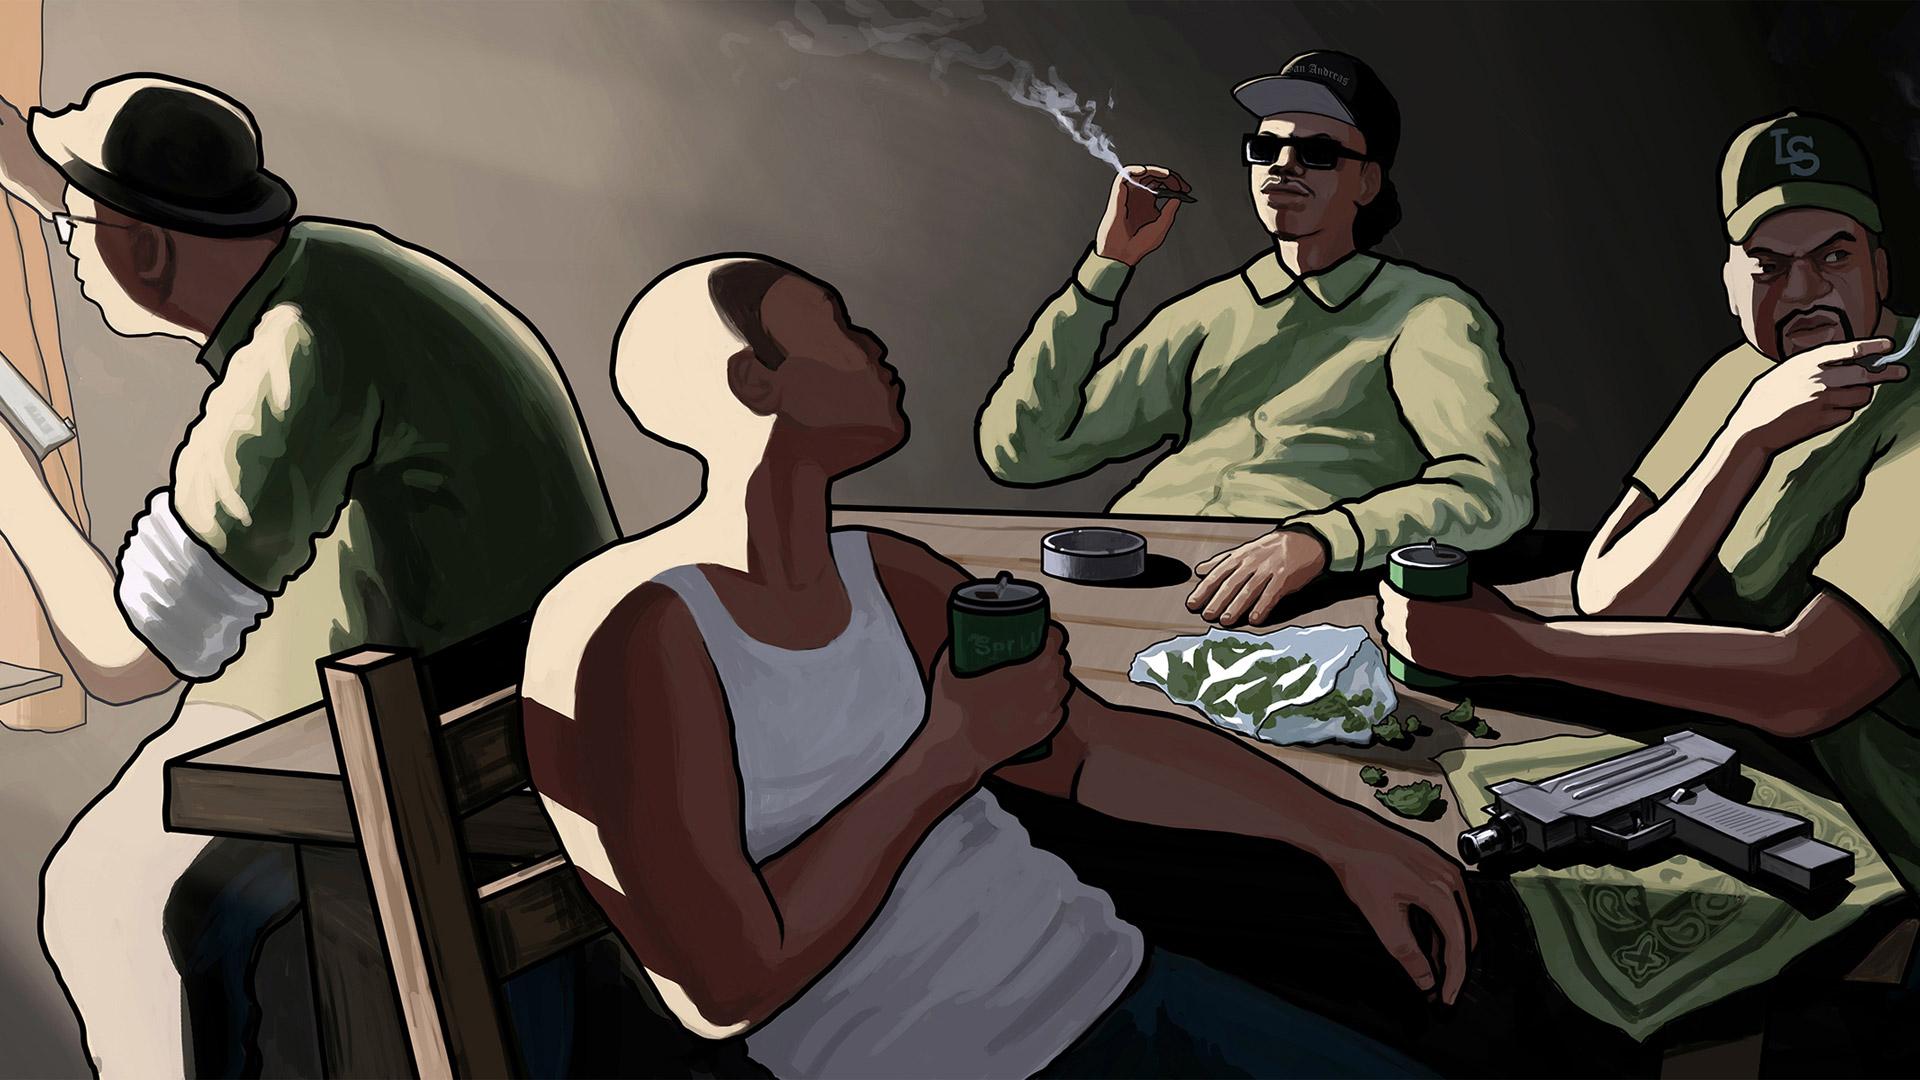 Free Grand Theft Auto: San Andreas Wallpaper in 1920x1080